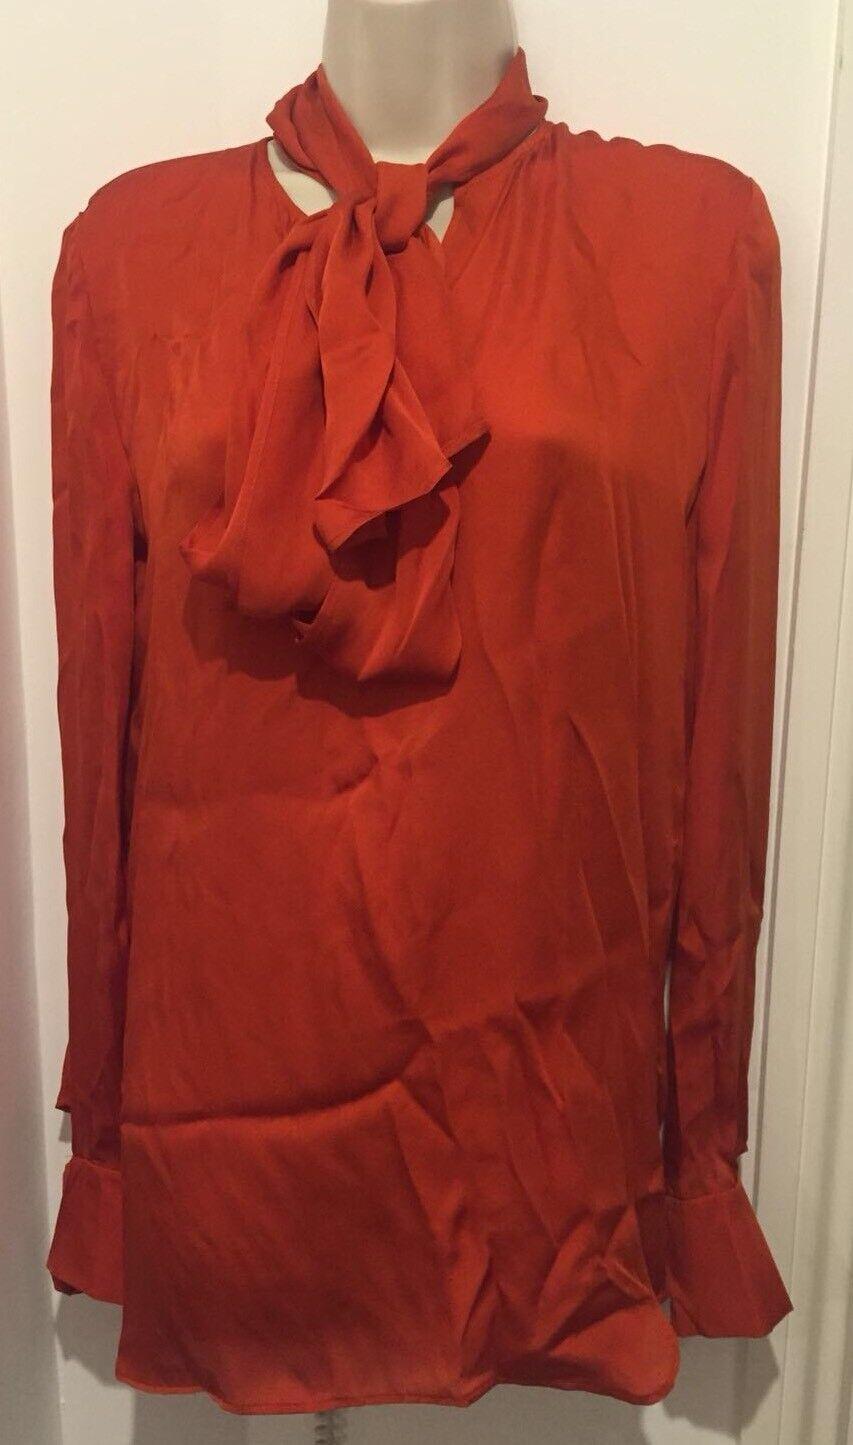 STELLA MCCARTNEY Orange Silk Top with Pussy Bow Größe IT 42